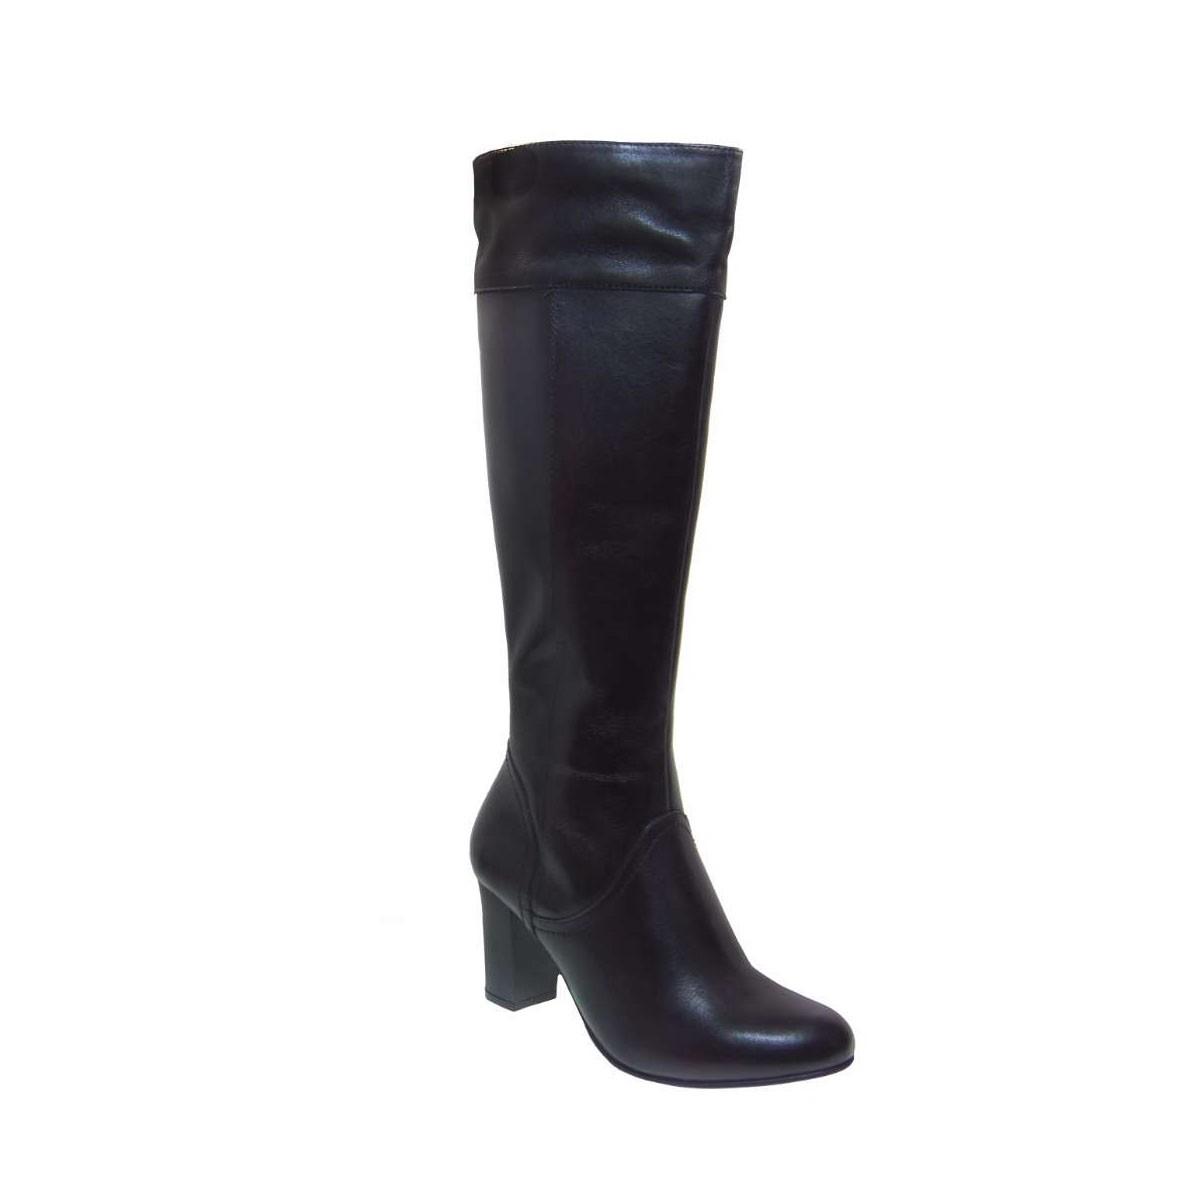 Caprice 25510-022 Ανατομική Μπότα Απο Γνήσιο Δέρμα Μαύρη